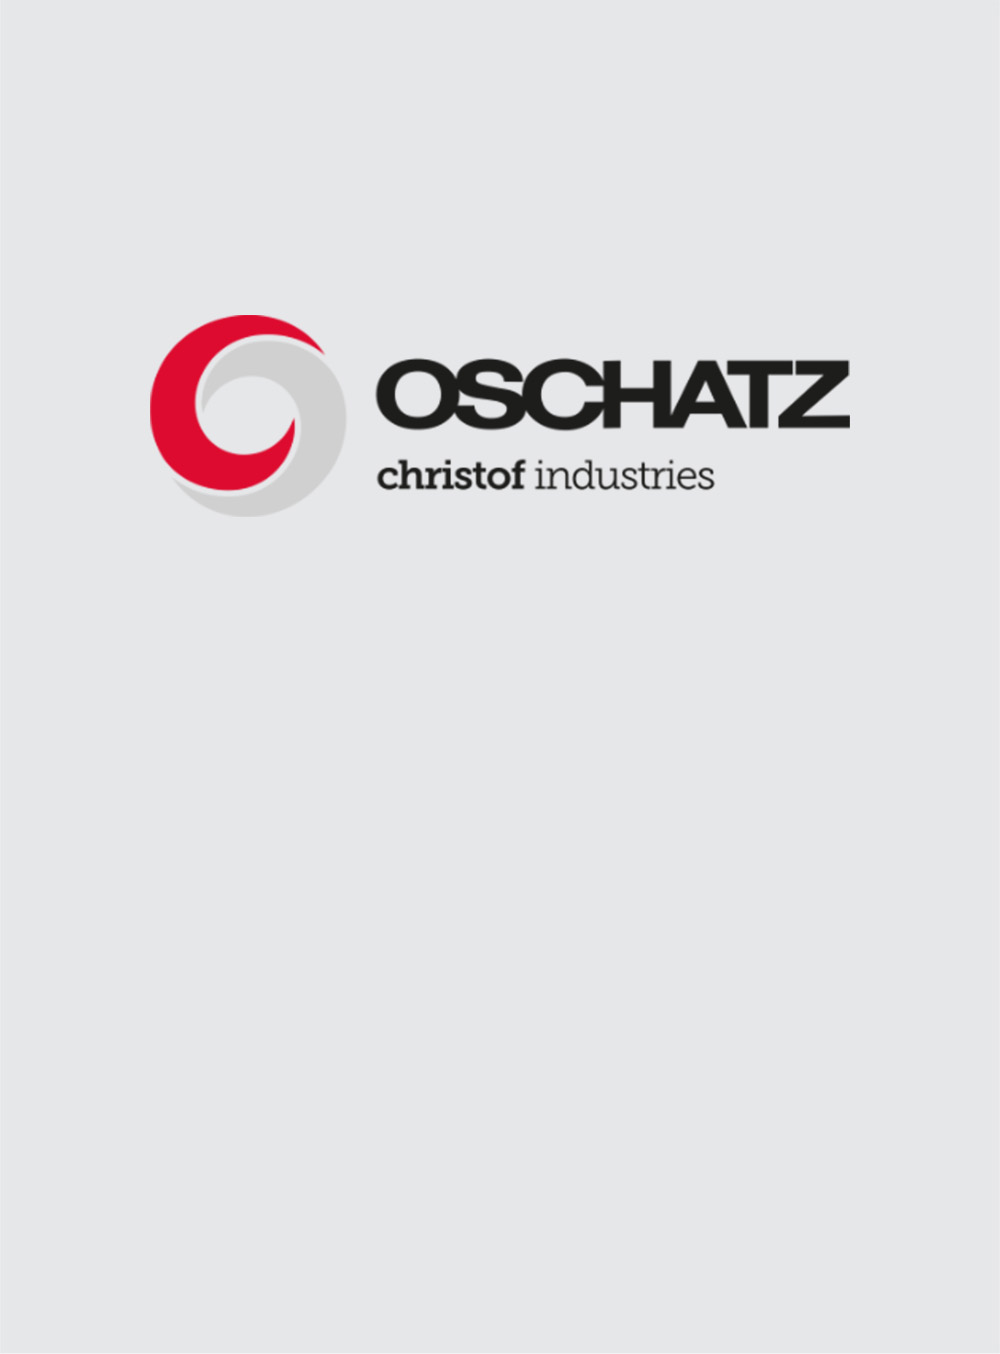 Logo Oschatz